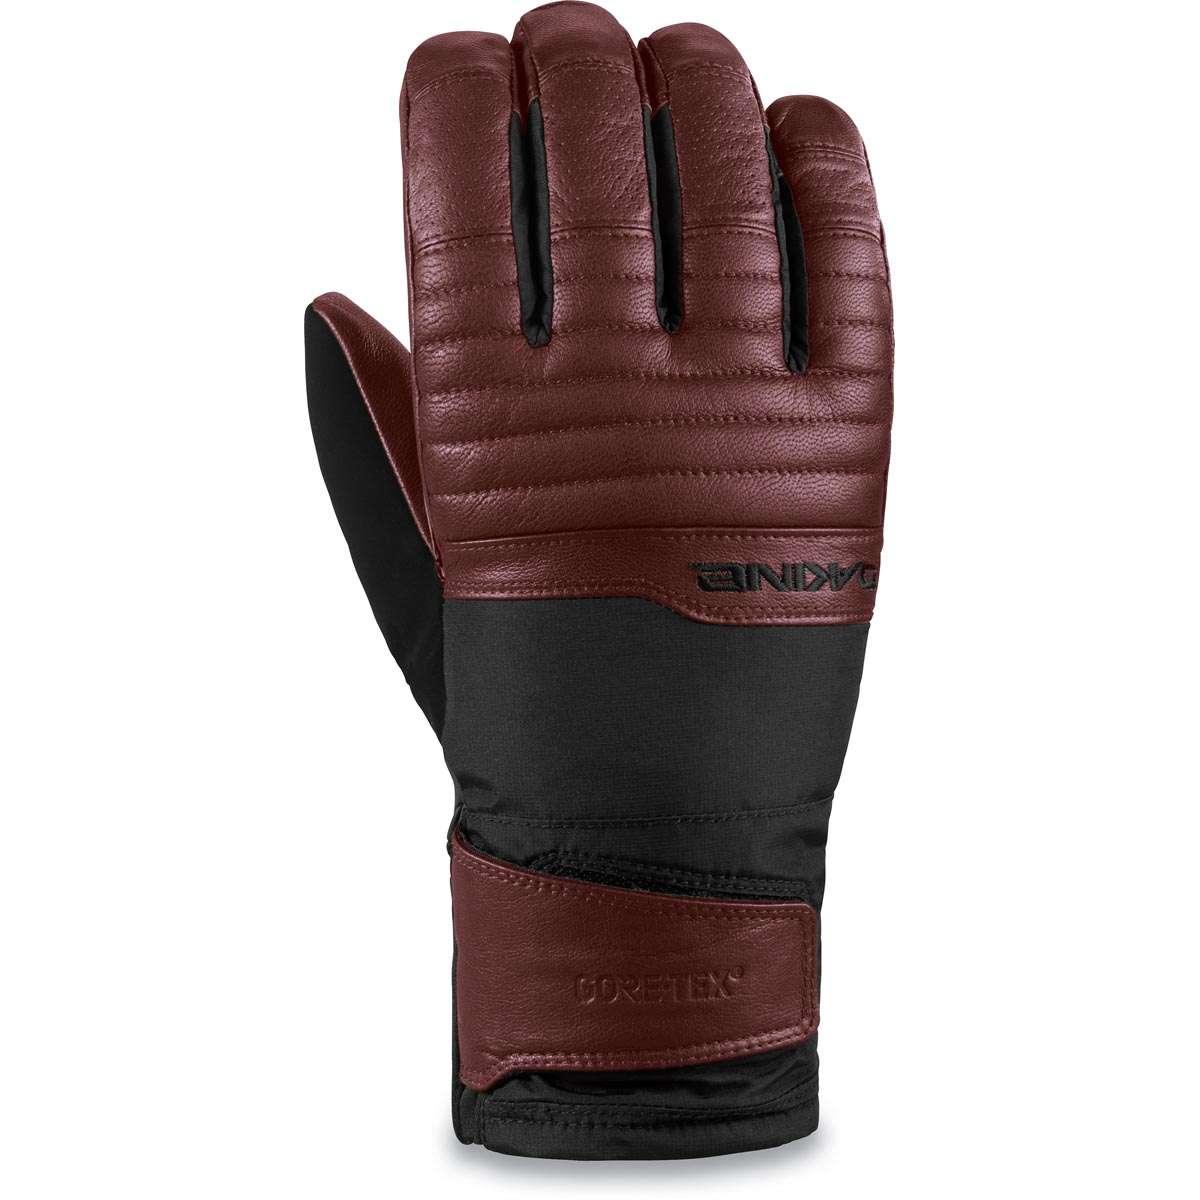 90d631fa68981 Dakine Maverick Glove Herren Ski-   Snowboard Handschuhe Black ...